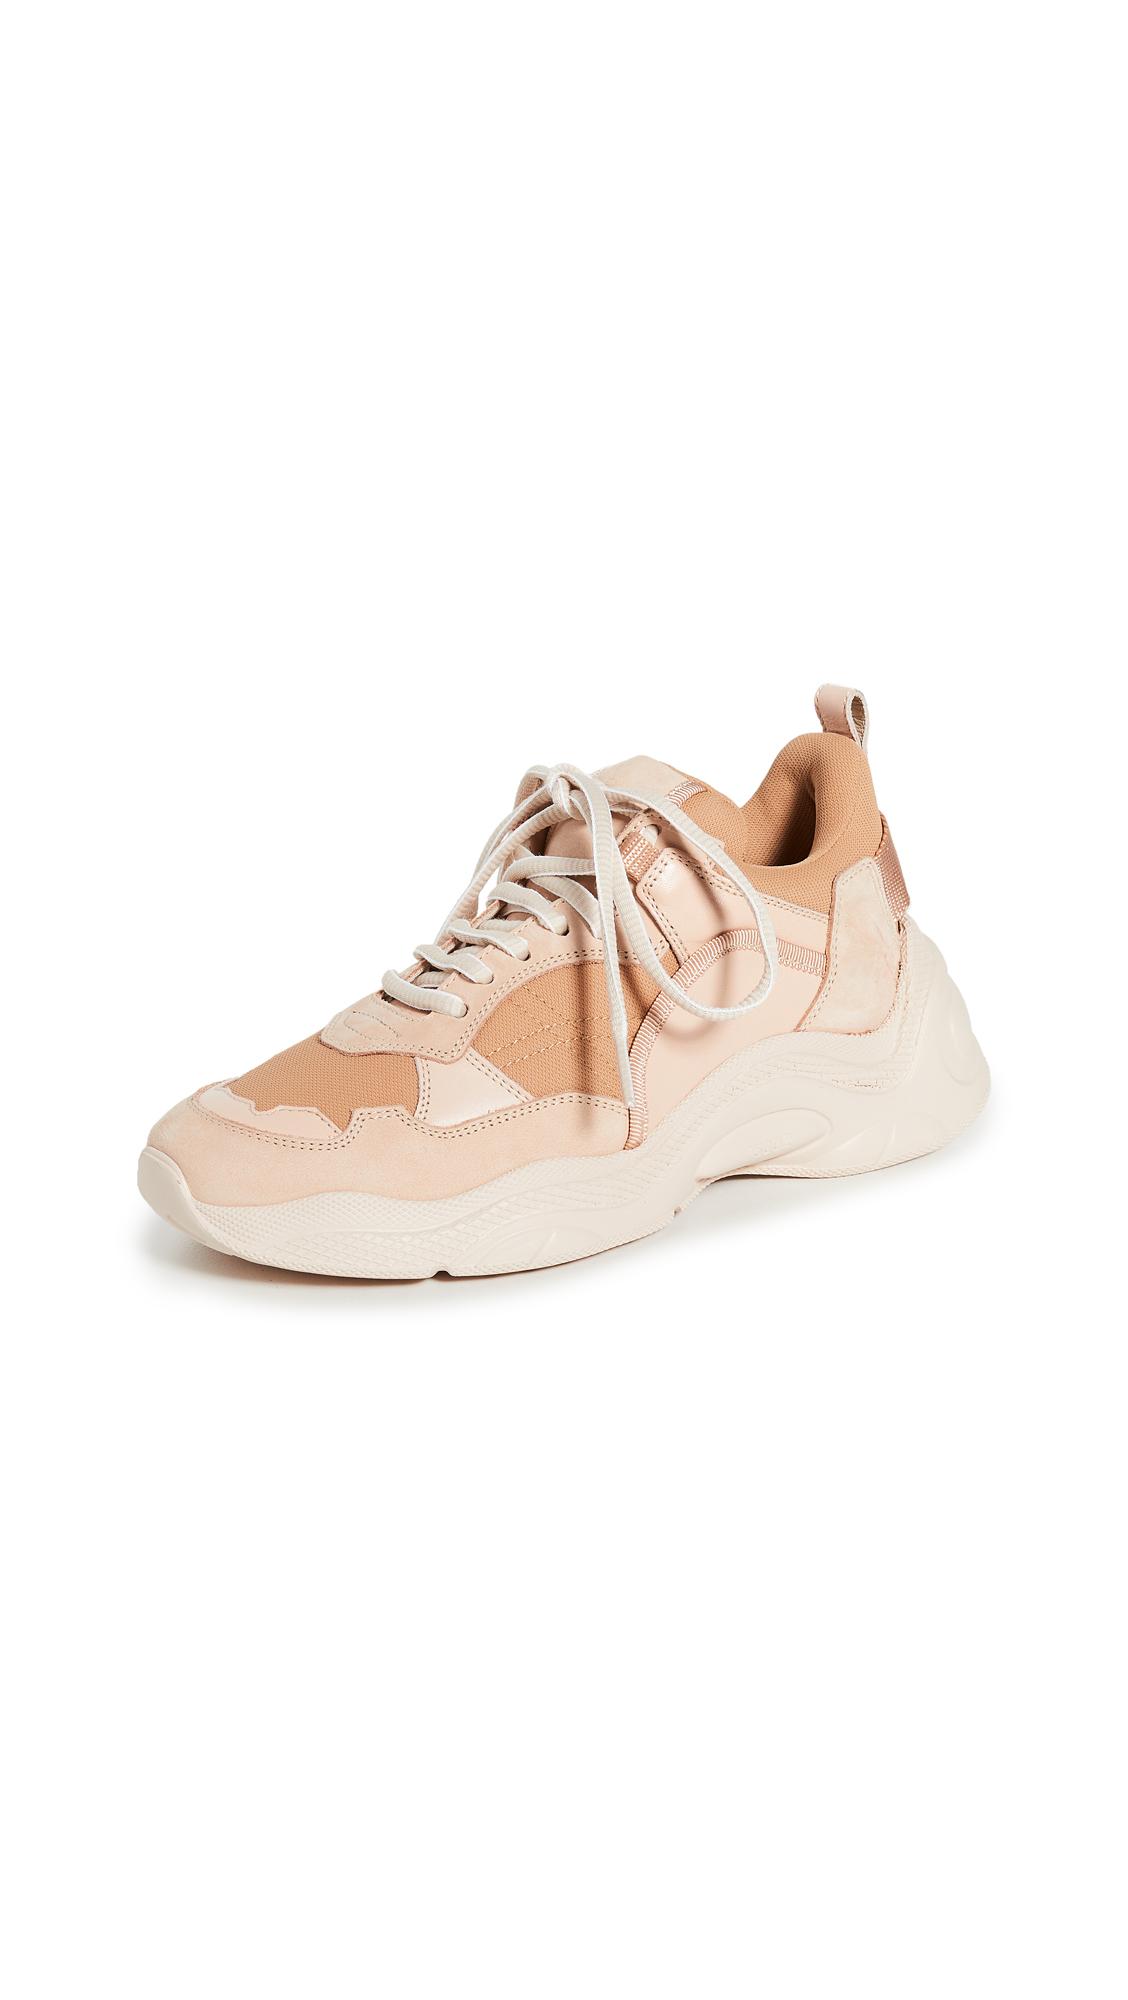 IRO Curve Runner Sneakers - 30% Off Sale